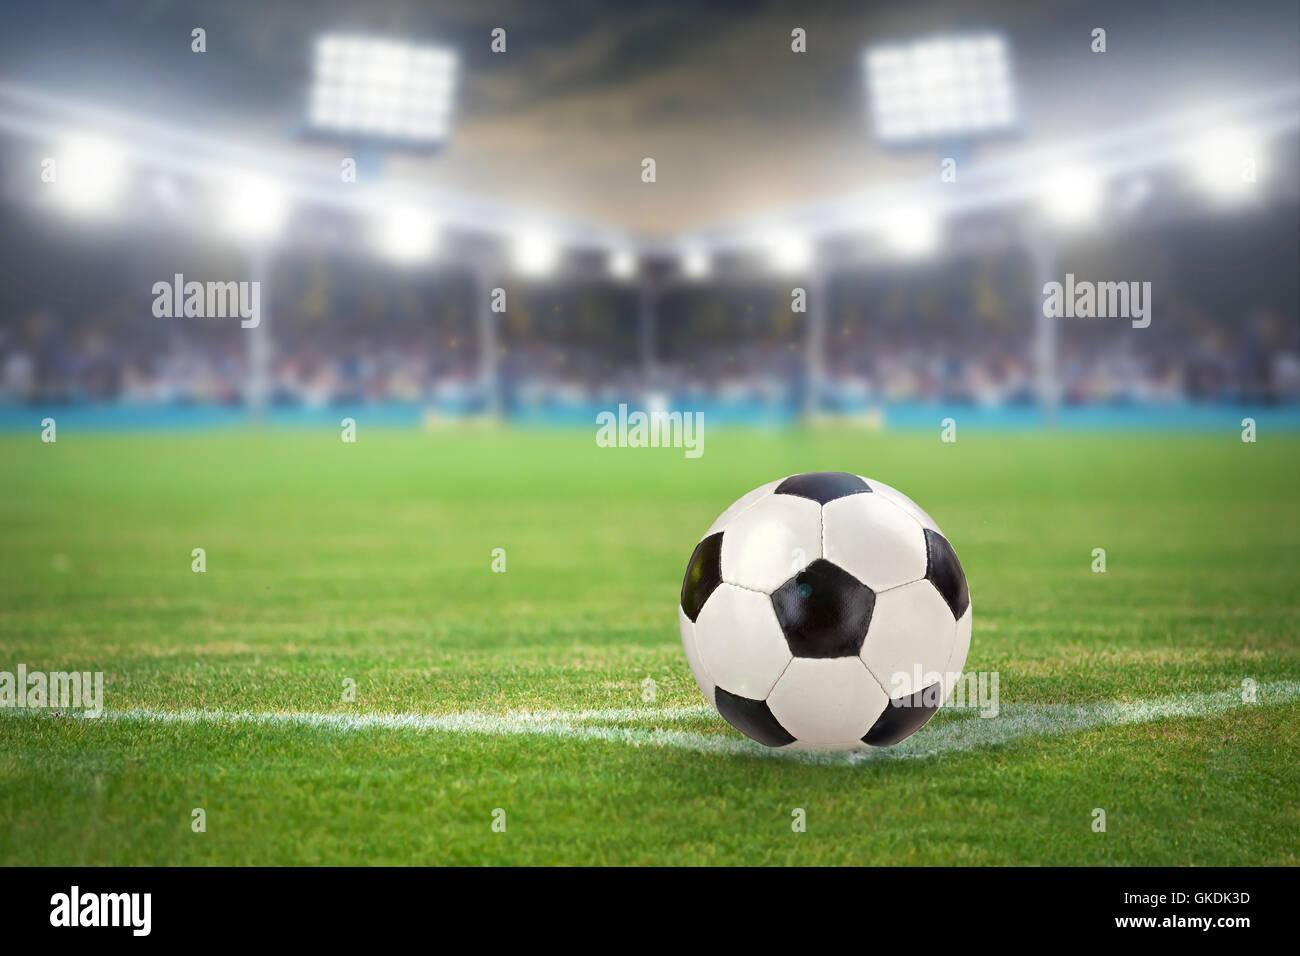 football stadium - Stock Image